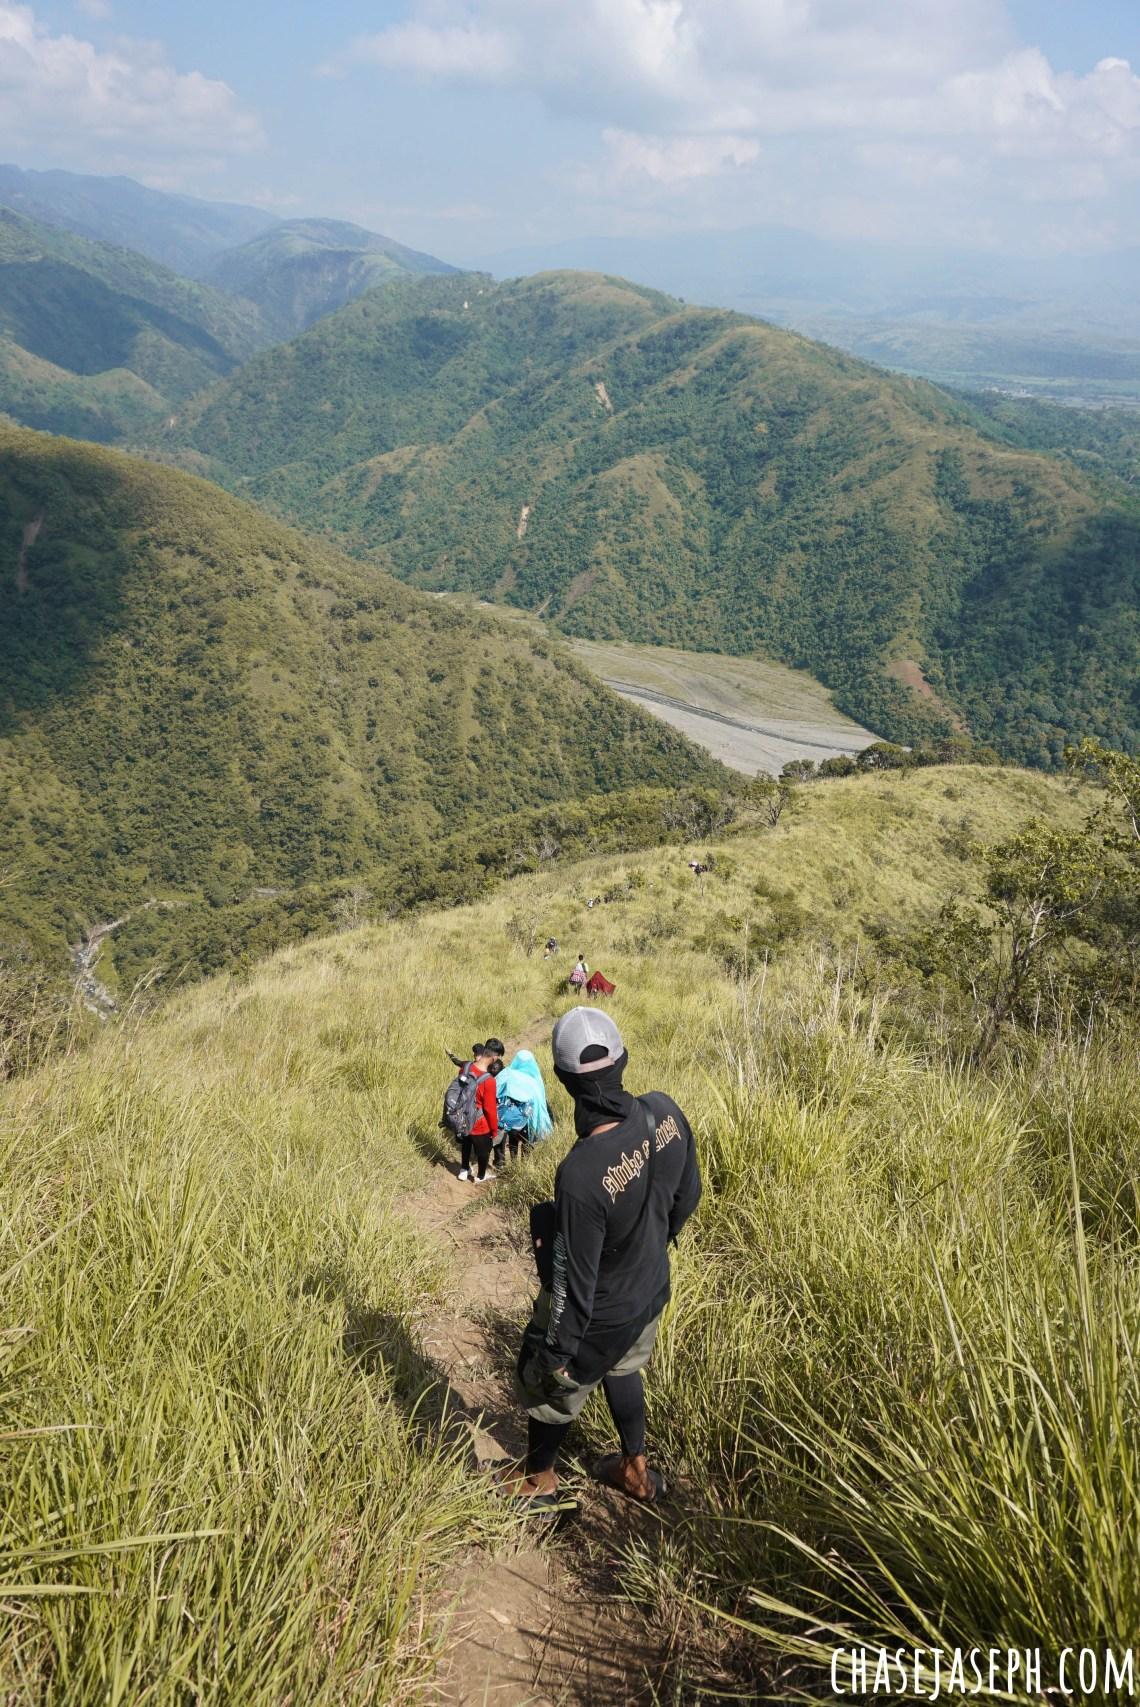 Mt. 387 & Aloha Falls - Carranglan, Nueva Ecija (Climb Guide)